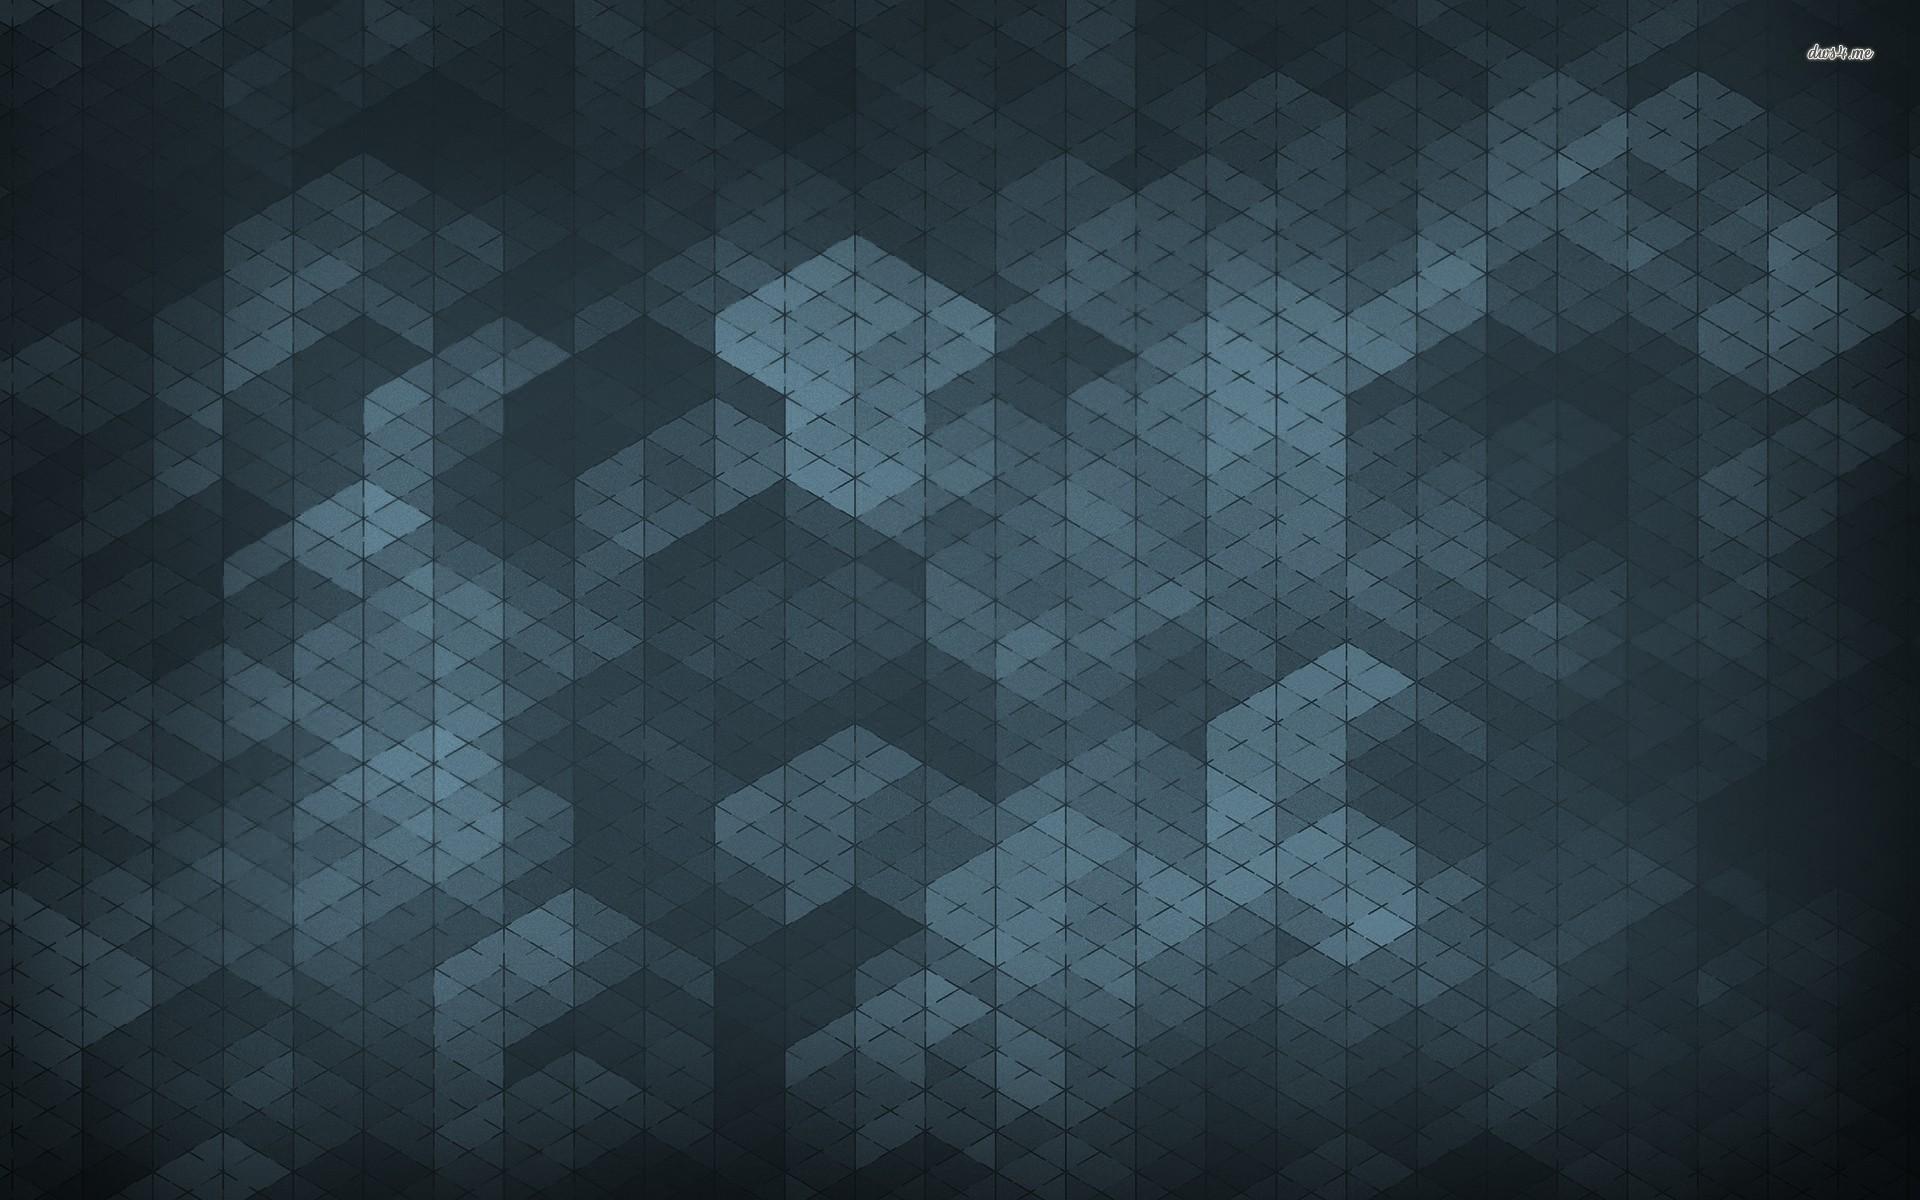 High Resolution Pattern Wallpapers Full Size – SiWallpaperHD 15012